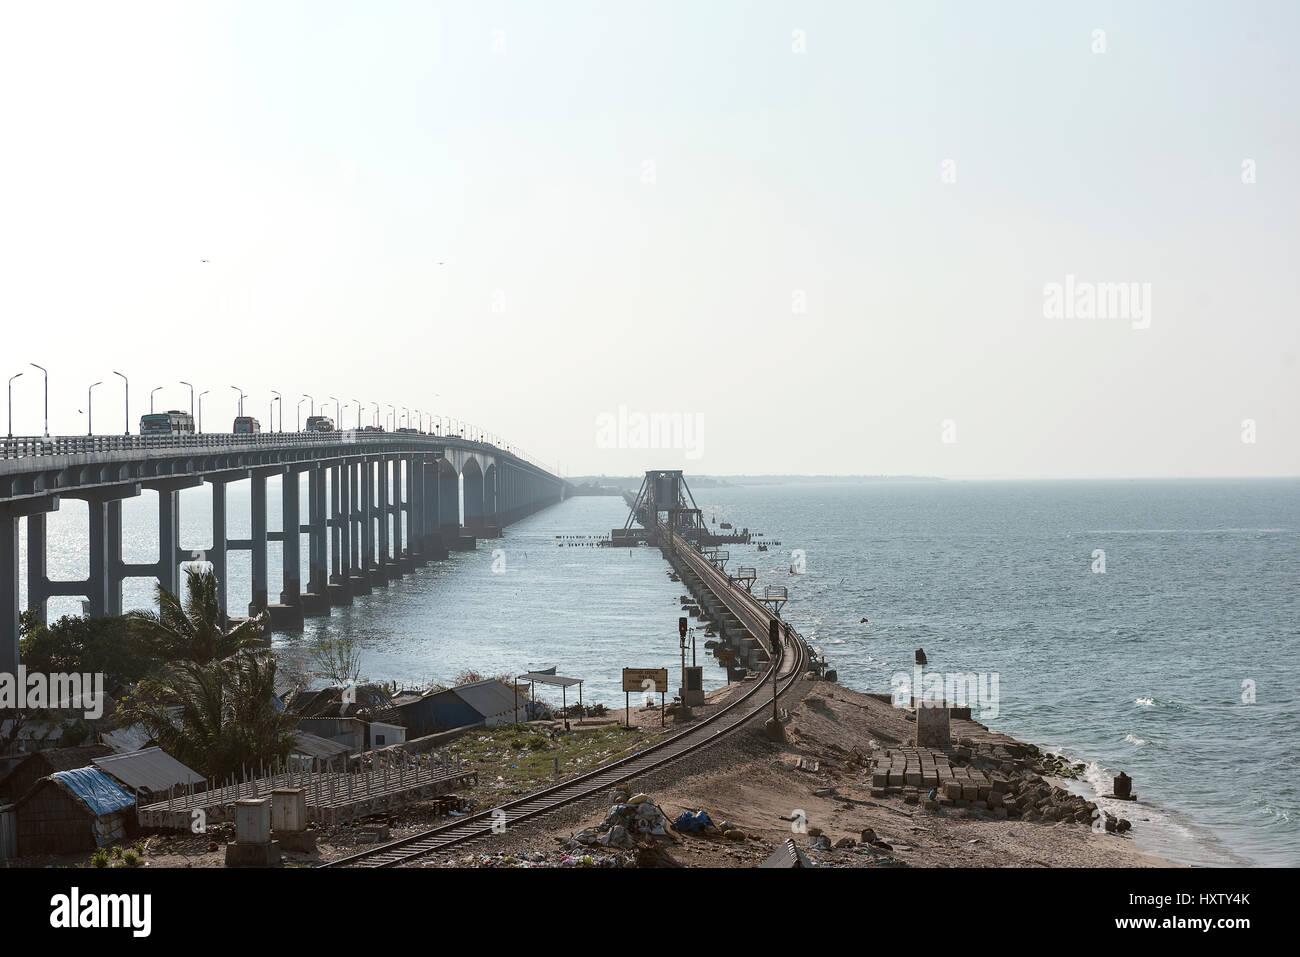 Cantilever Bridge in Pamban, India. - Stock Image